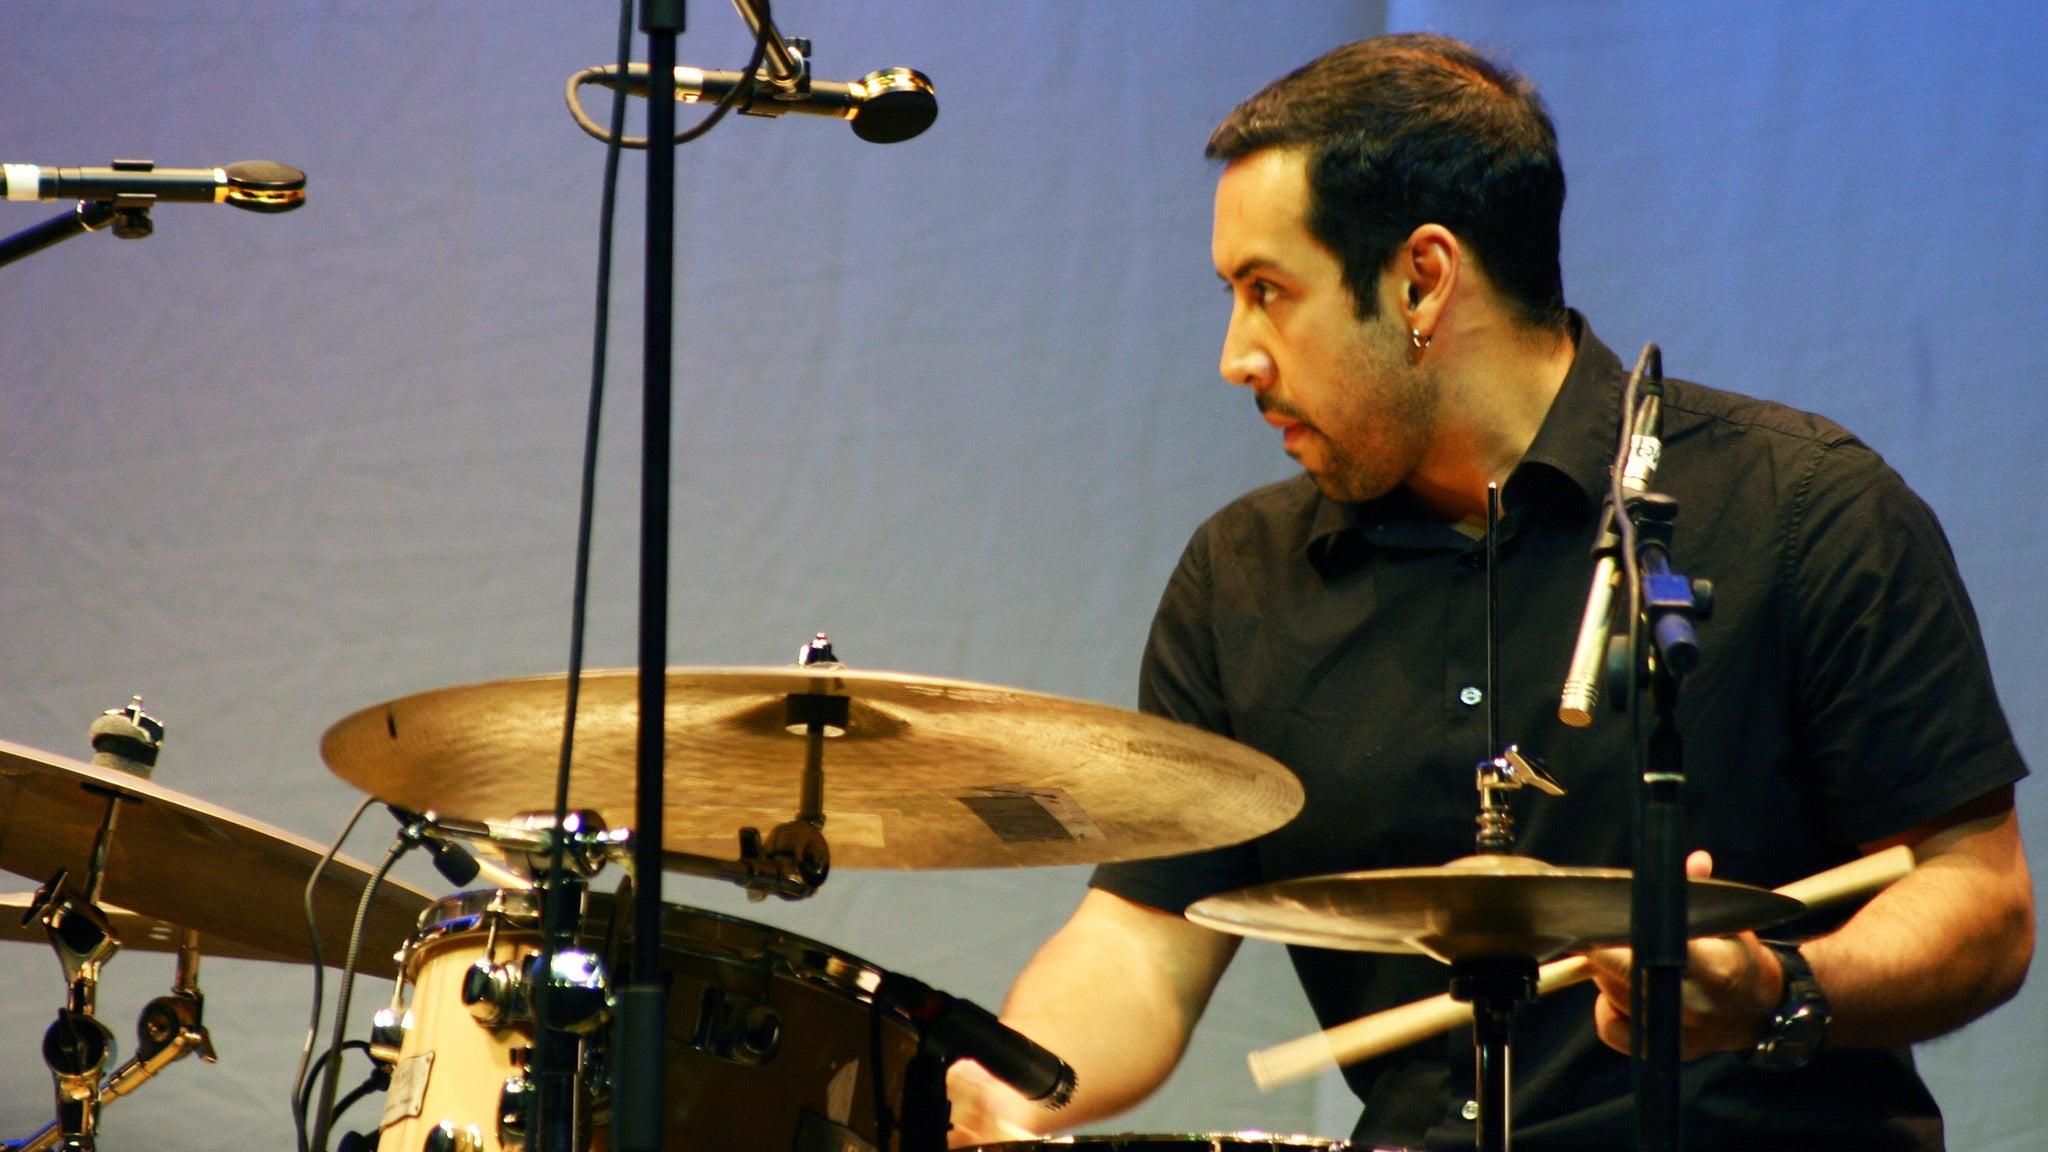 ANTONIO SANCHEZ - BIRDMAN LIVE at Music Hall Center